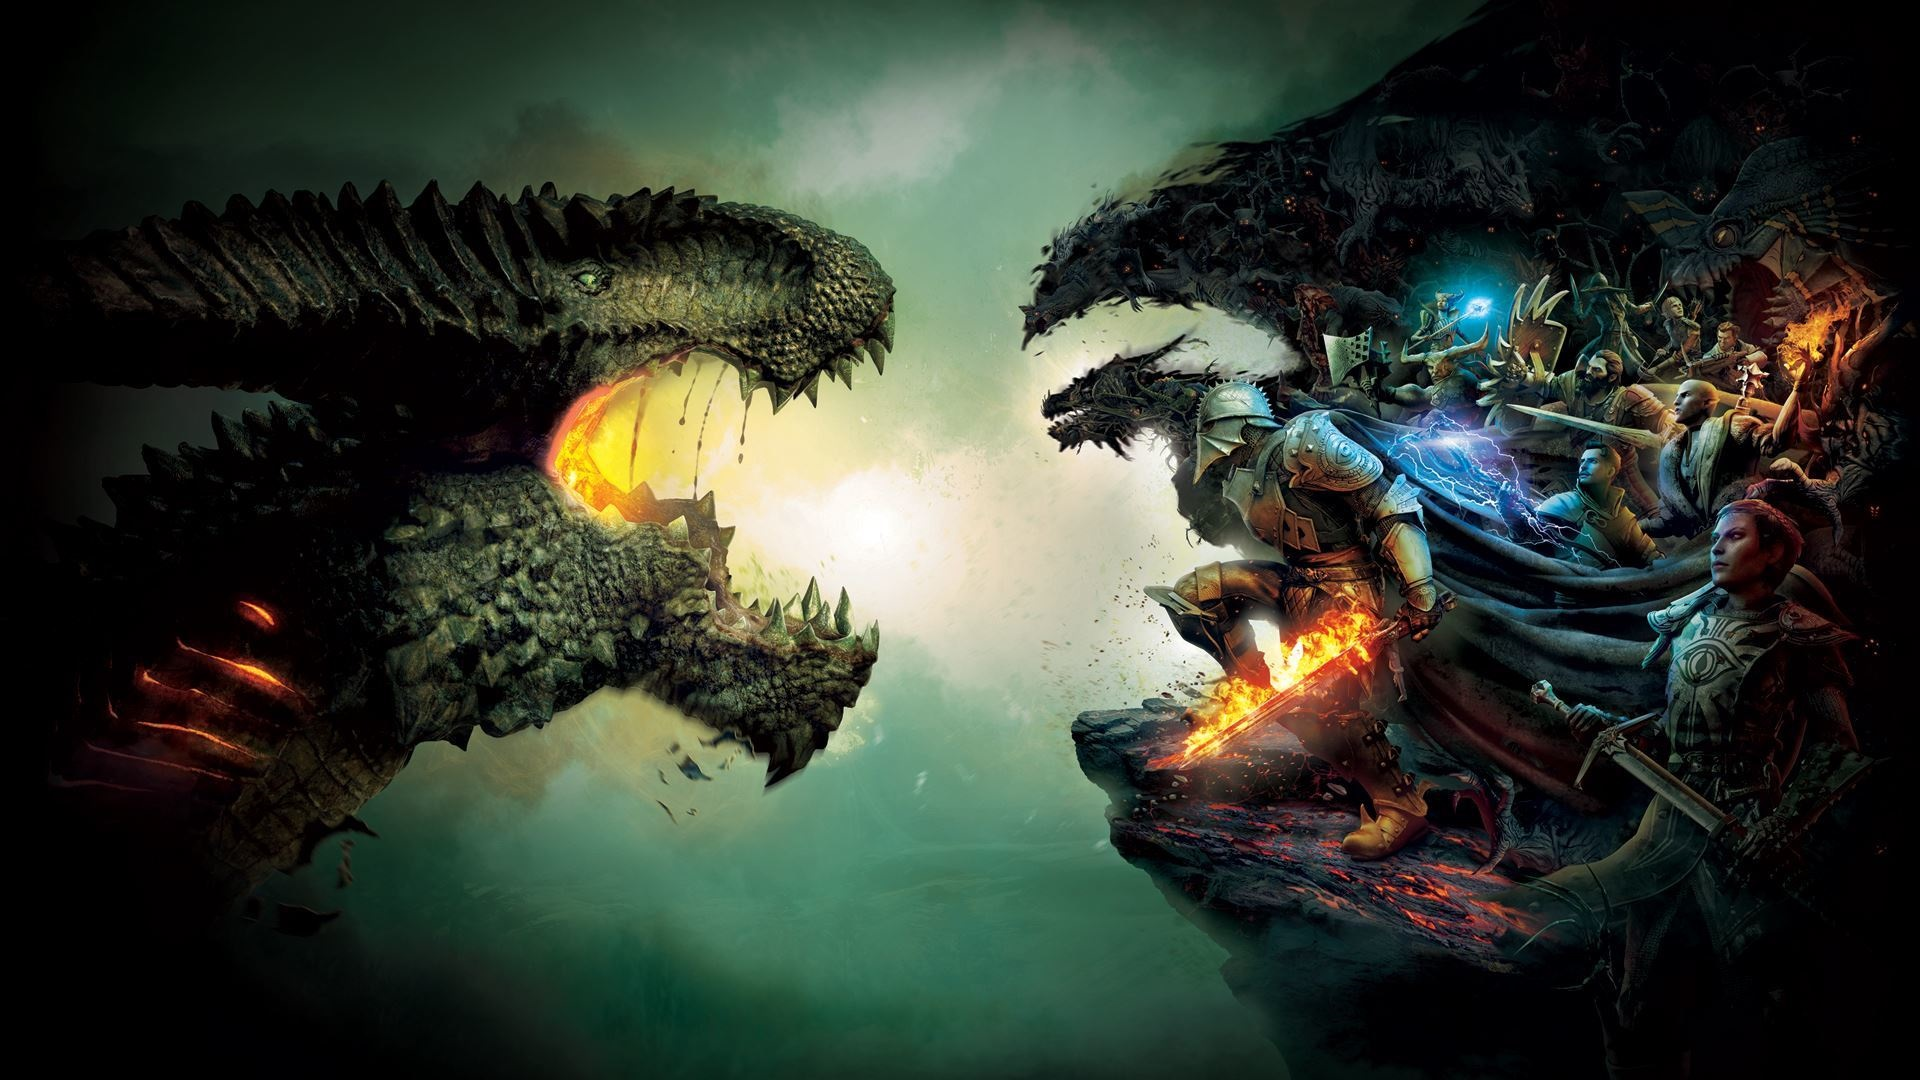 Wallpaper Dragon Age Inquisition Games Hd 1920x1080 Full Hd 2k